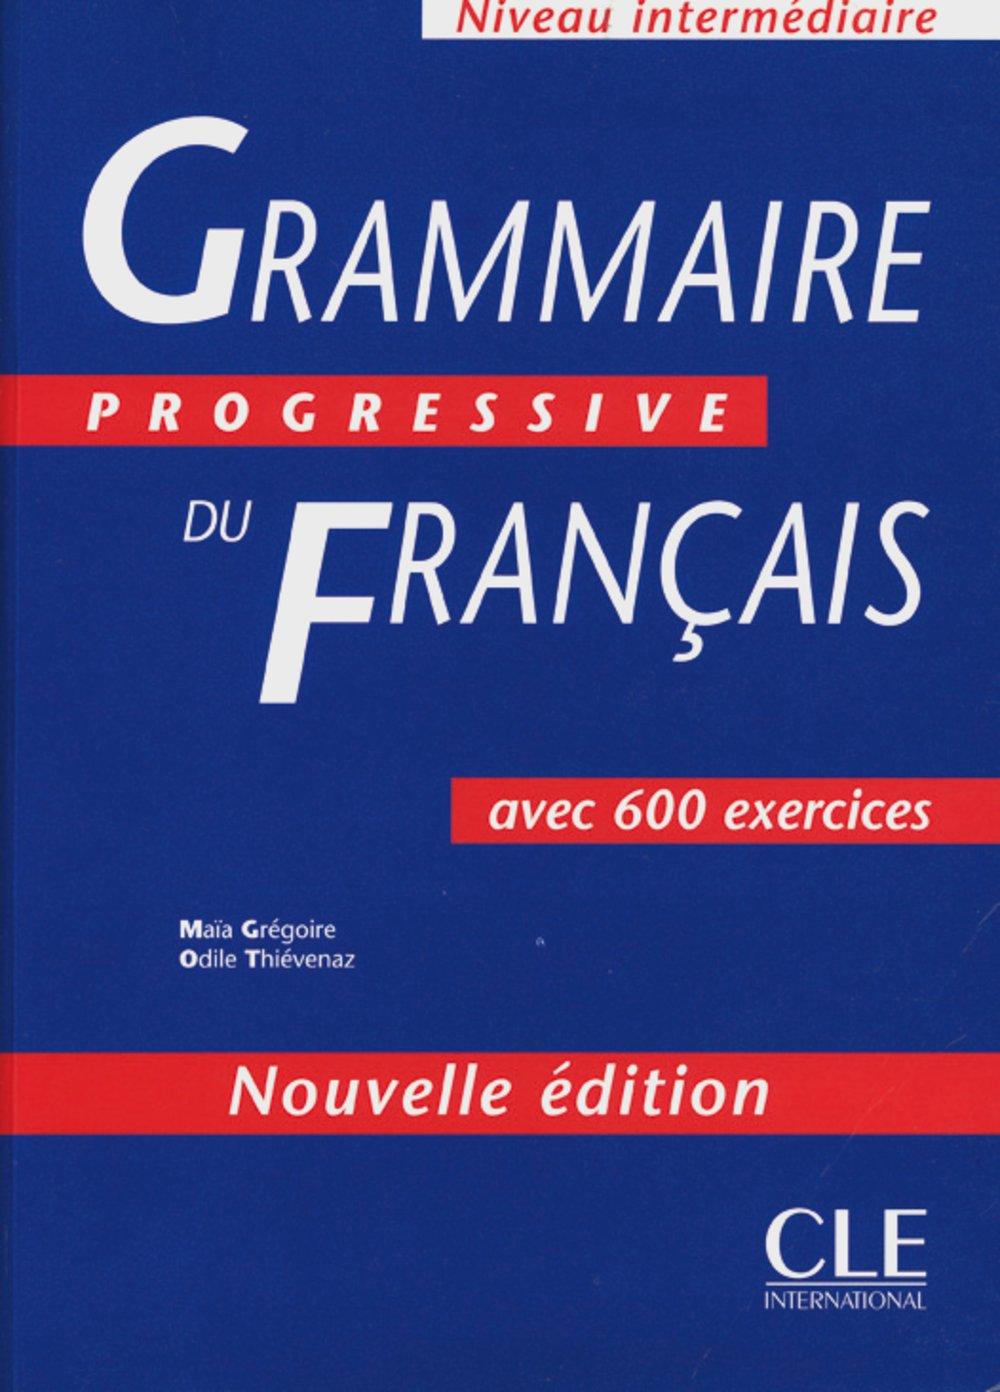 Grammaire Progressive Du Francais Intermediare French